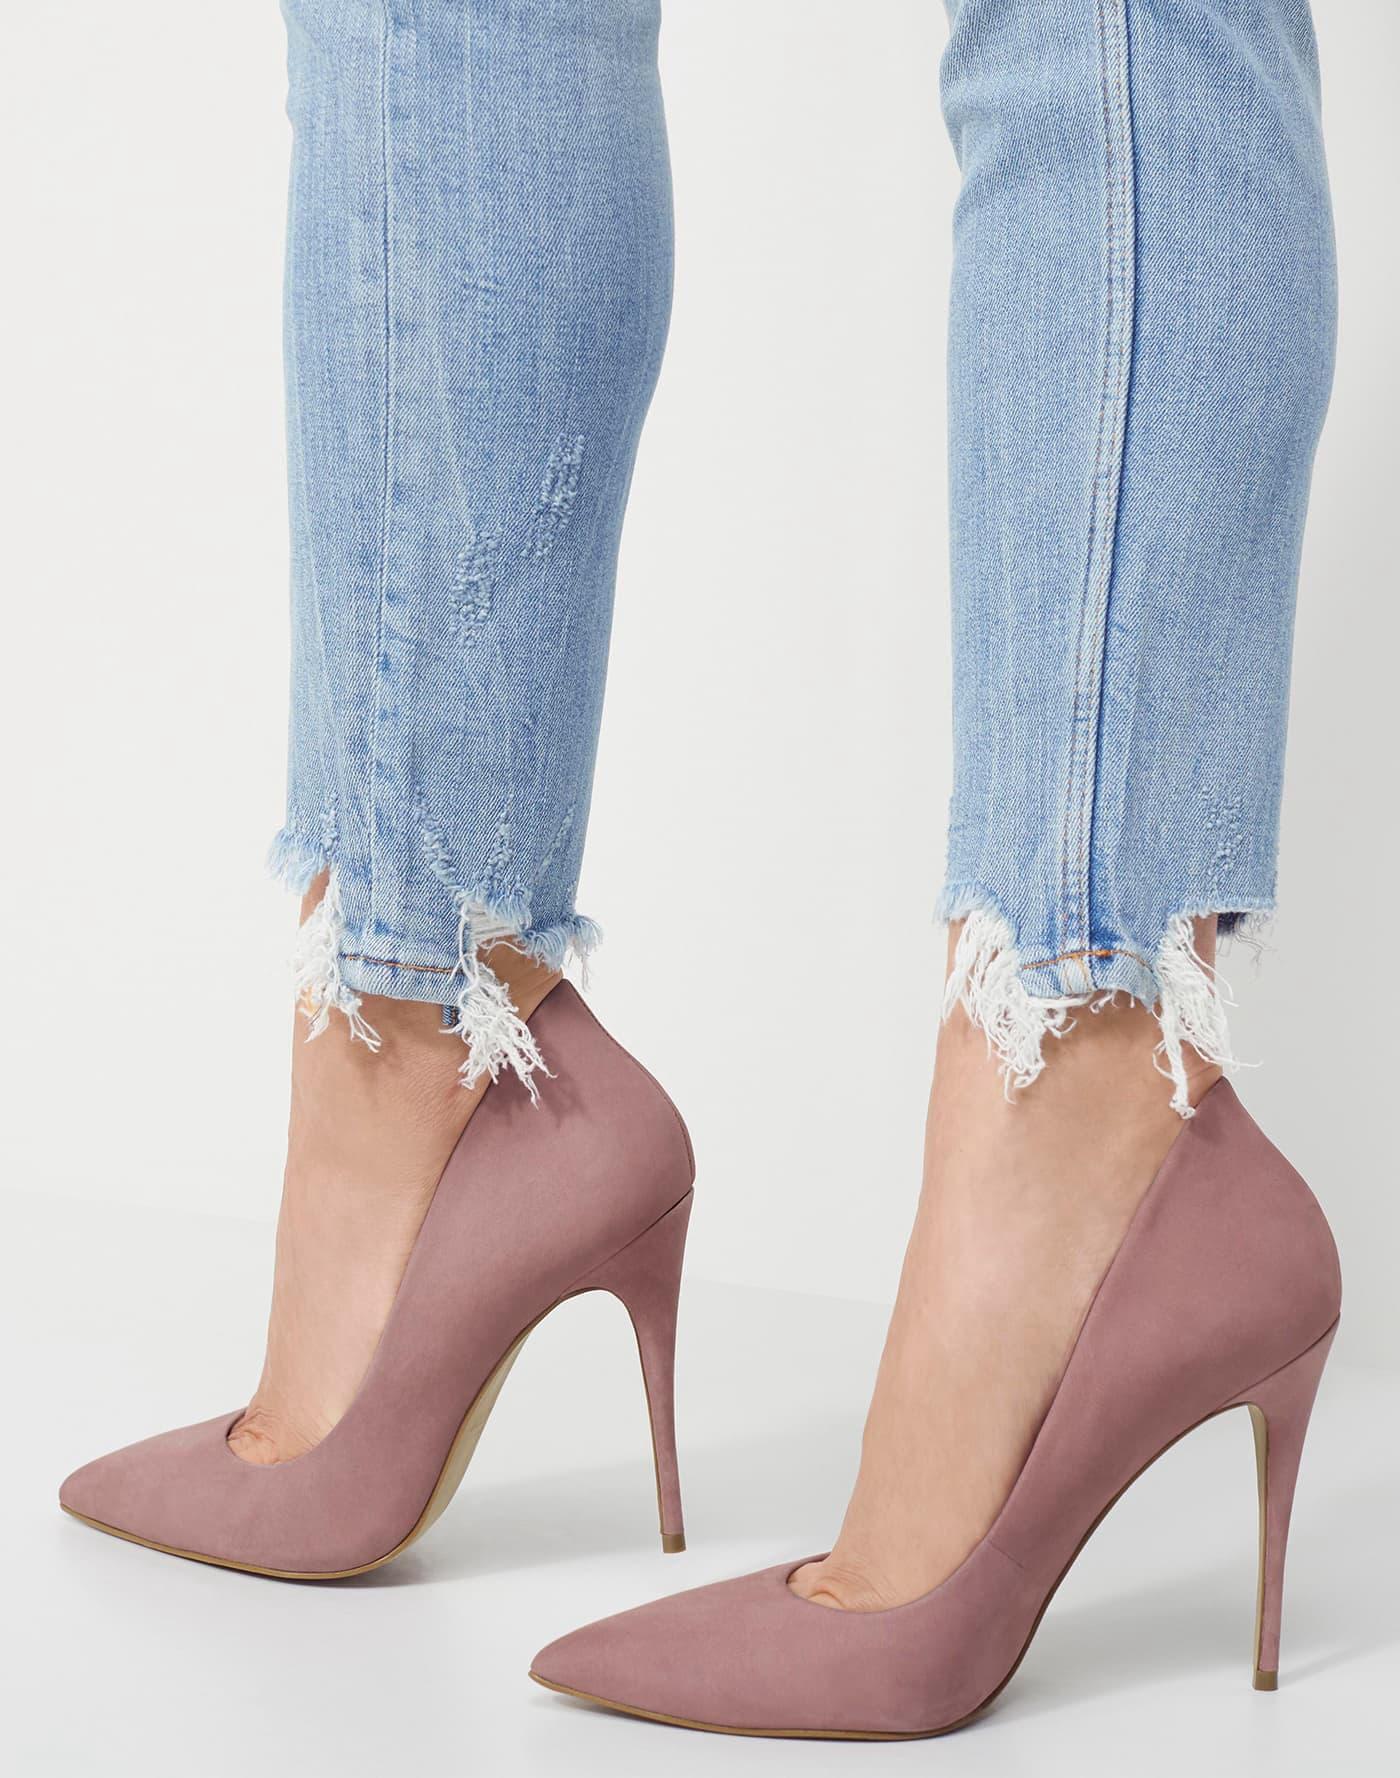 Velvet Shoes Canada